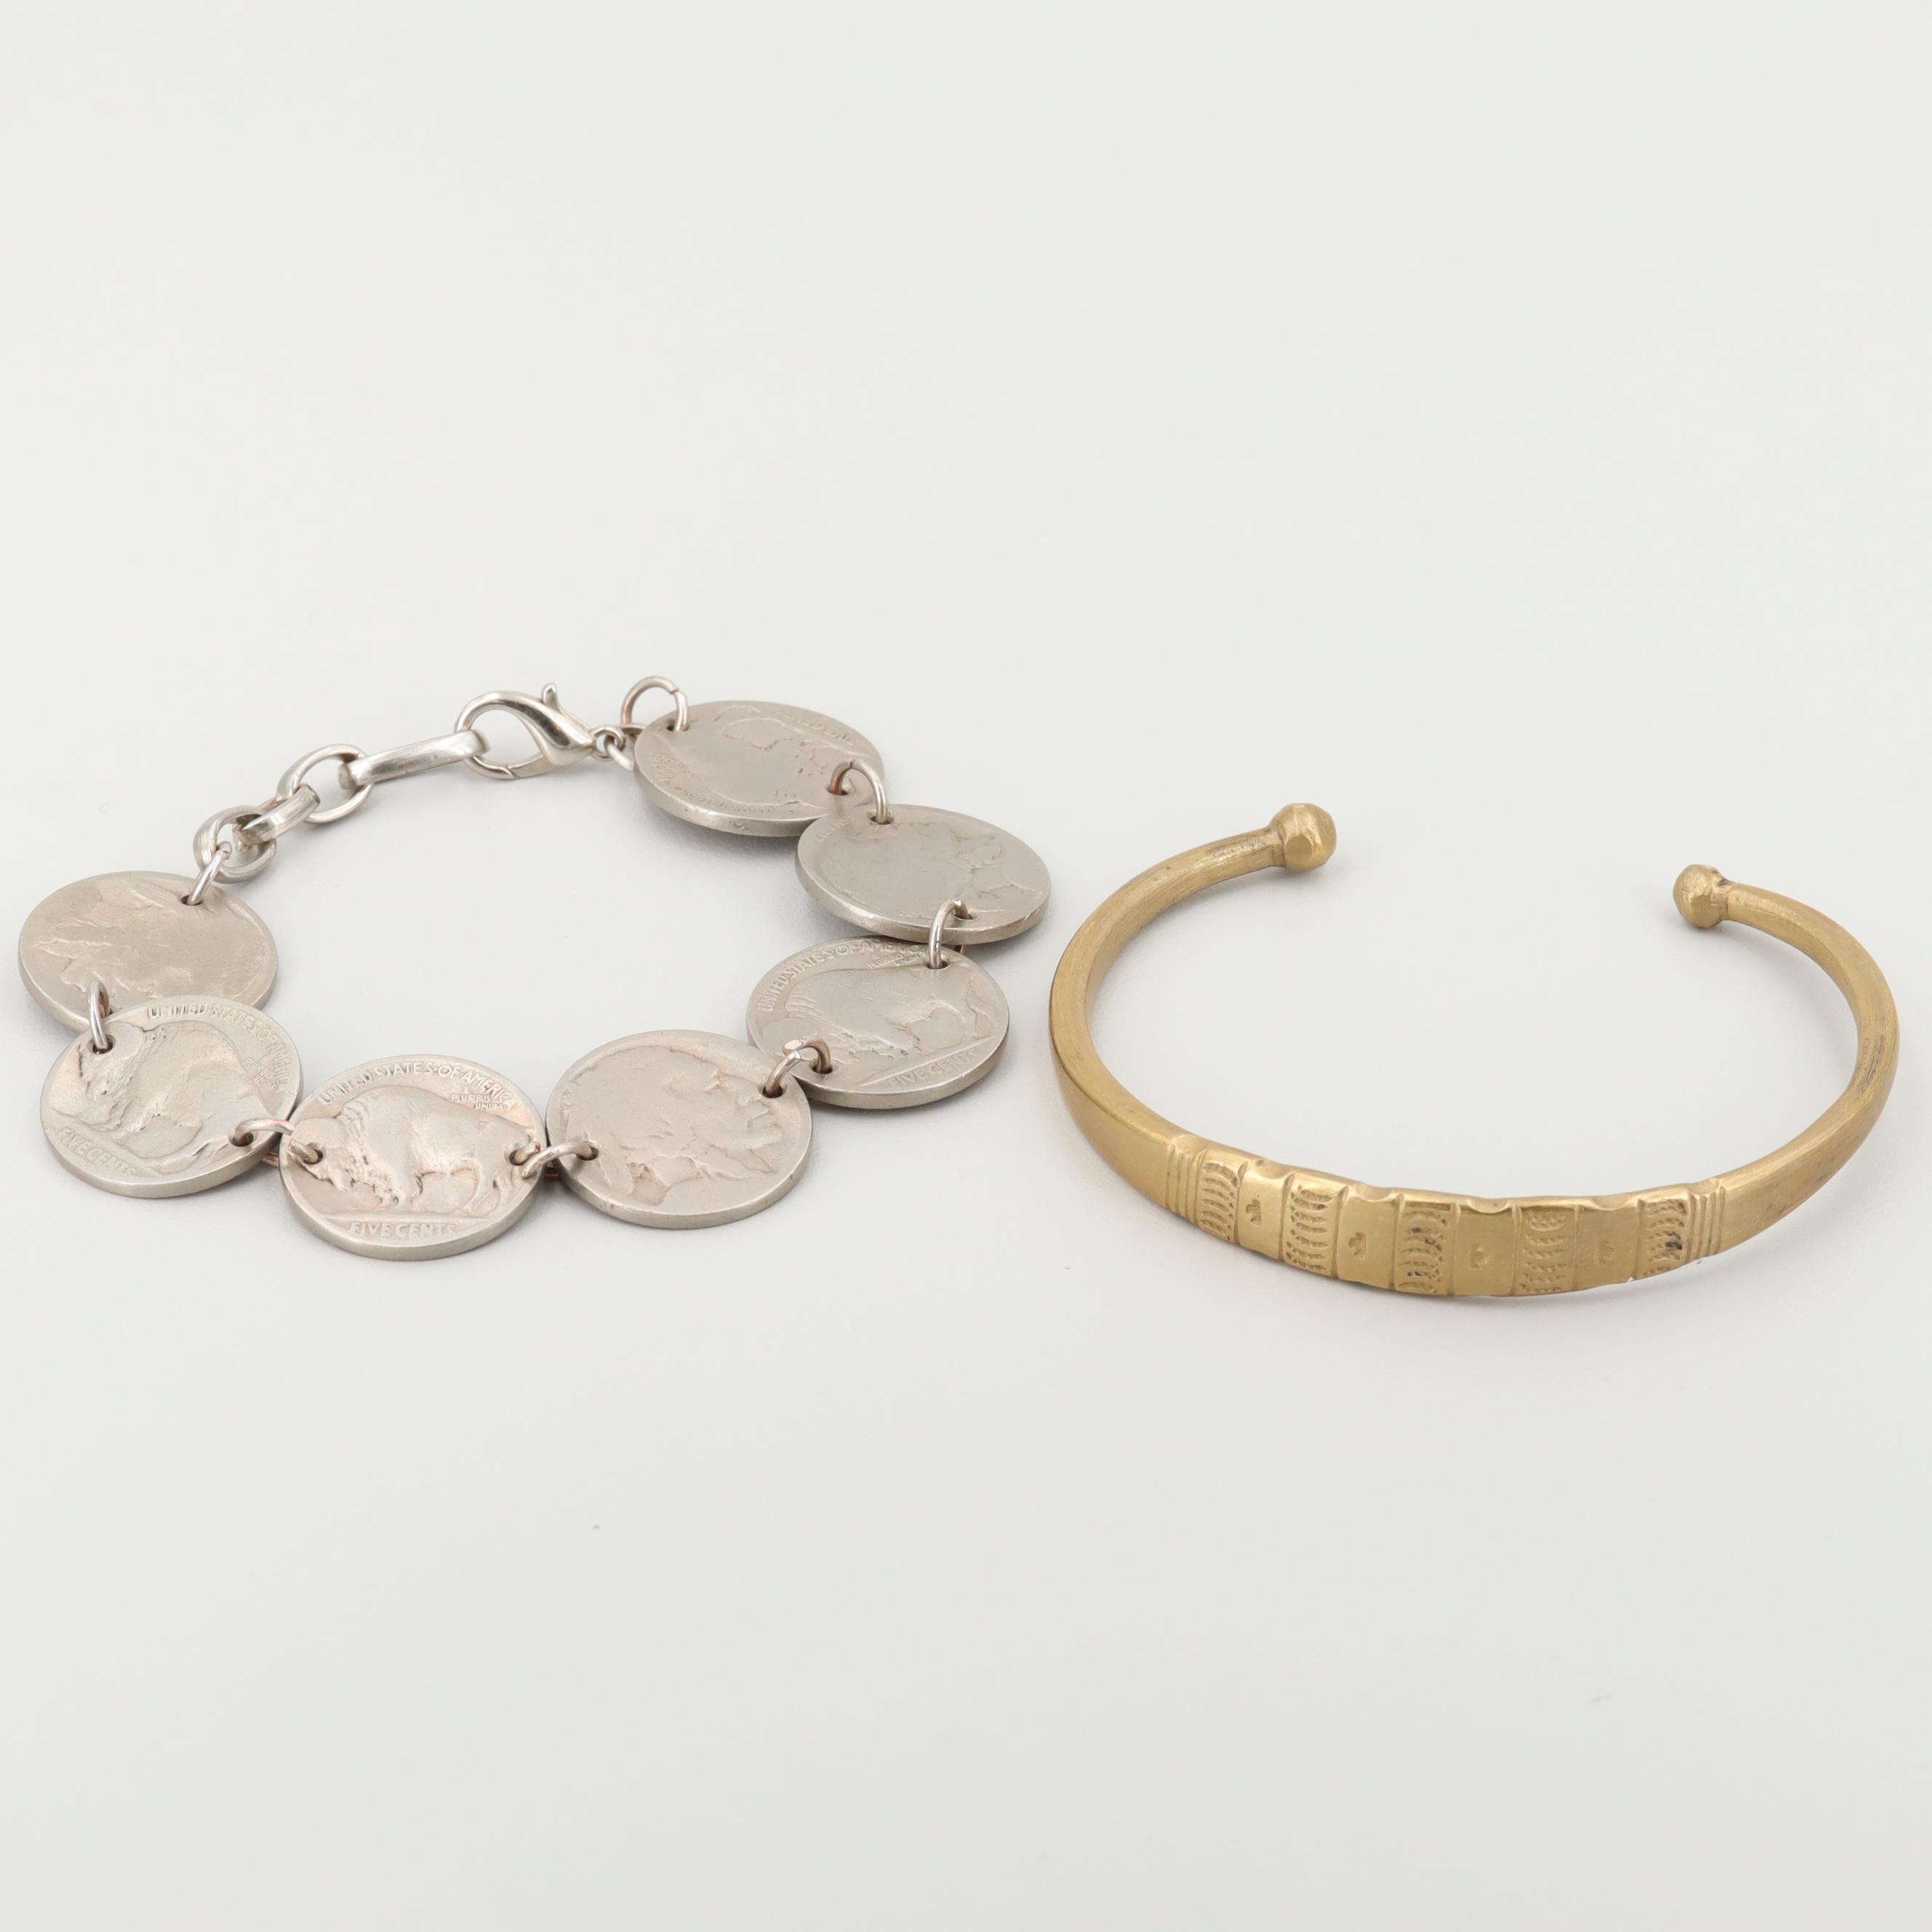 Silver Tone Buffalo Nickle and Bronze Tone Bracelets